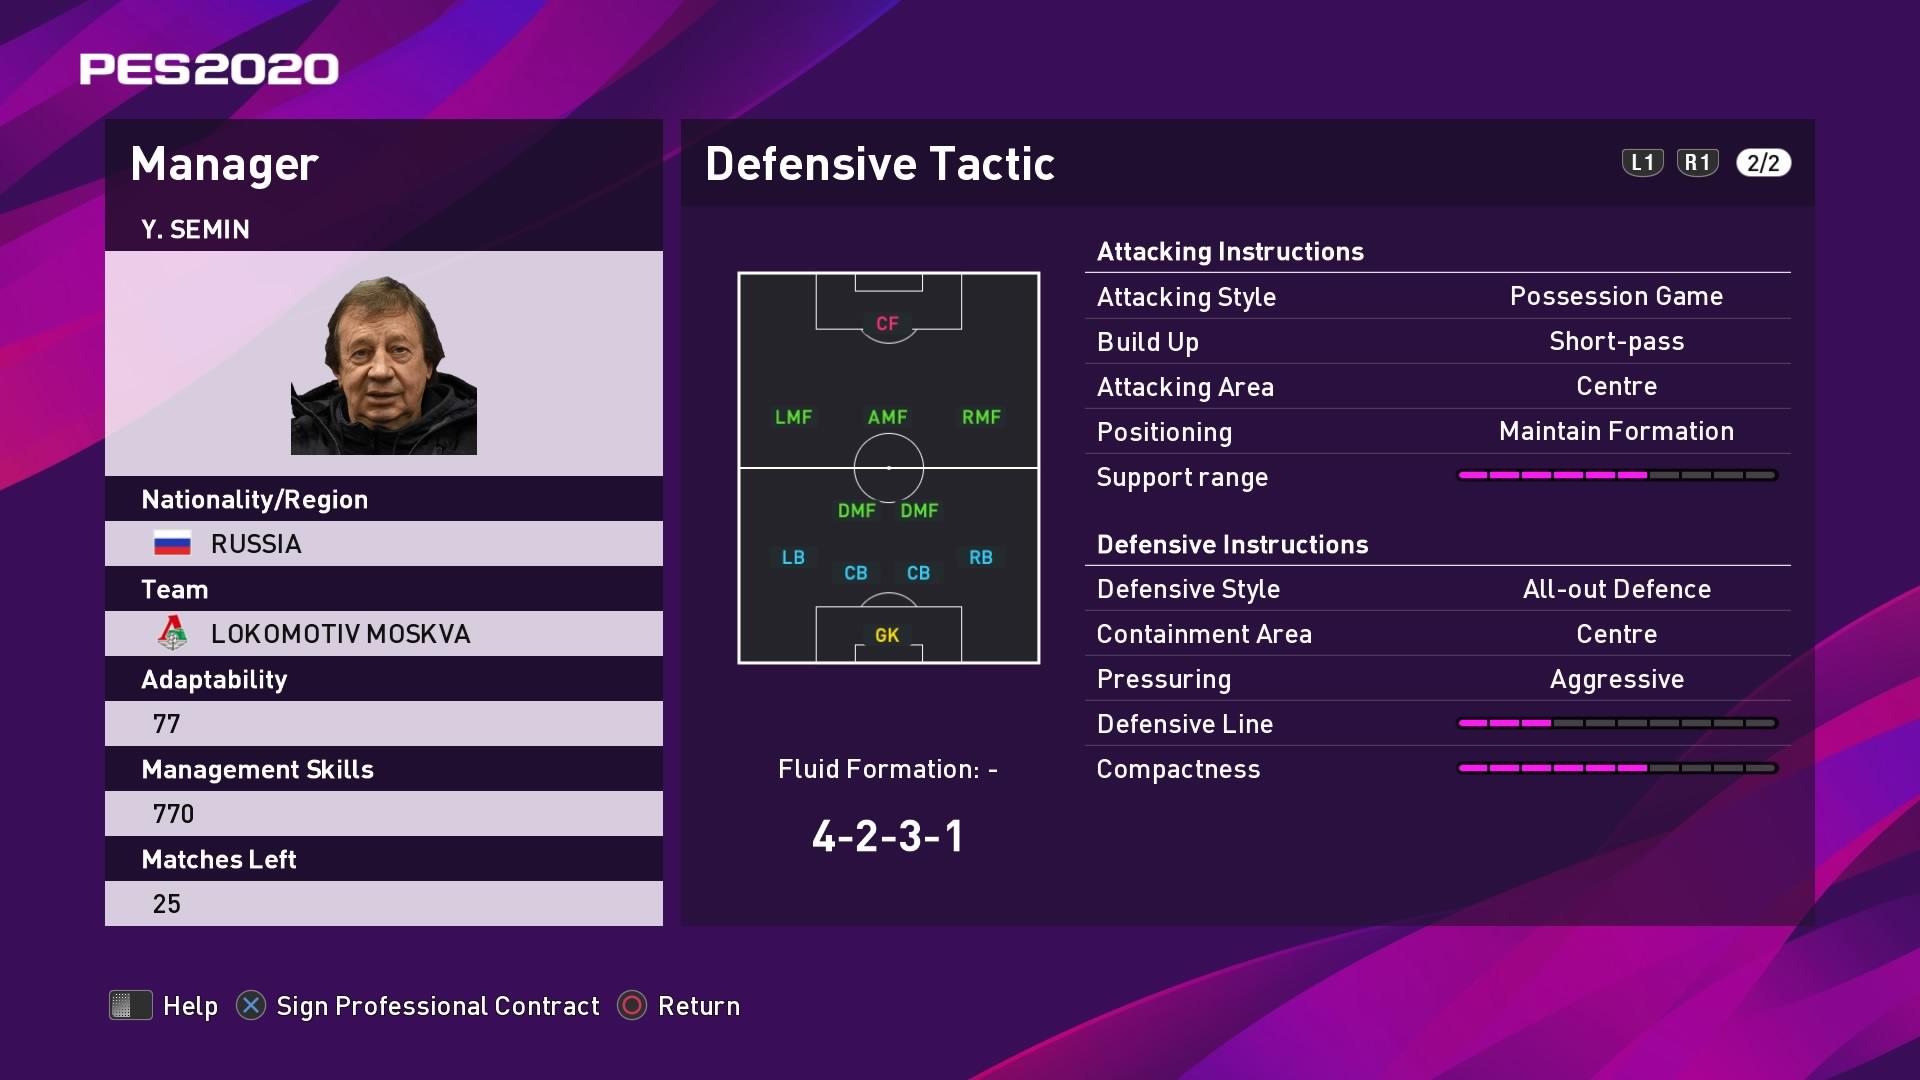 Y. Semin (3) (Yuri Semin) Defensive Tactic in PES 2020 myClub